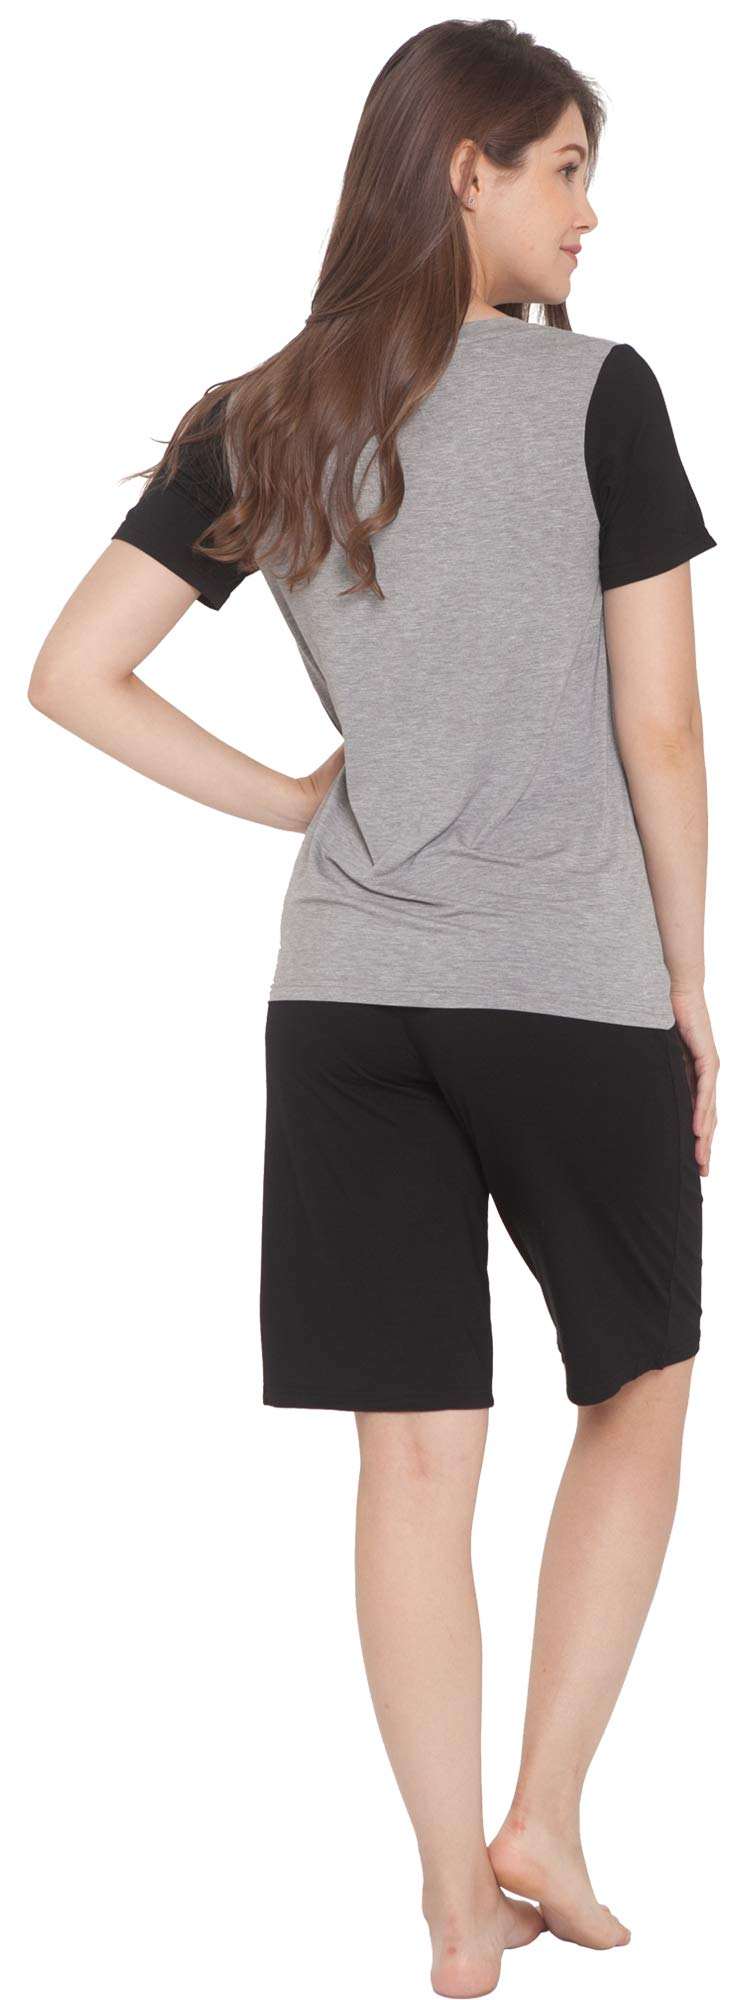 Lazycozy Women'S Scoop Neck Short -Sleeve Pajamas Set -